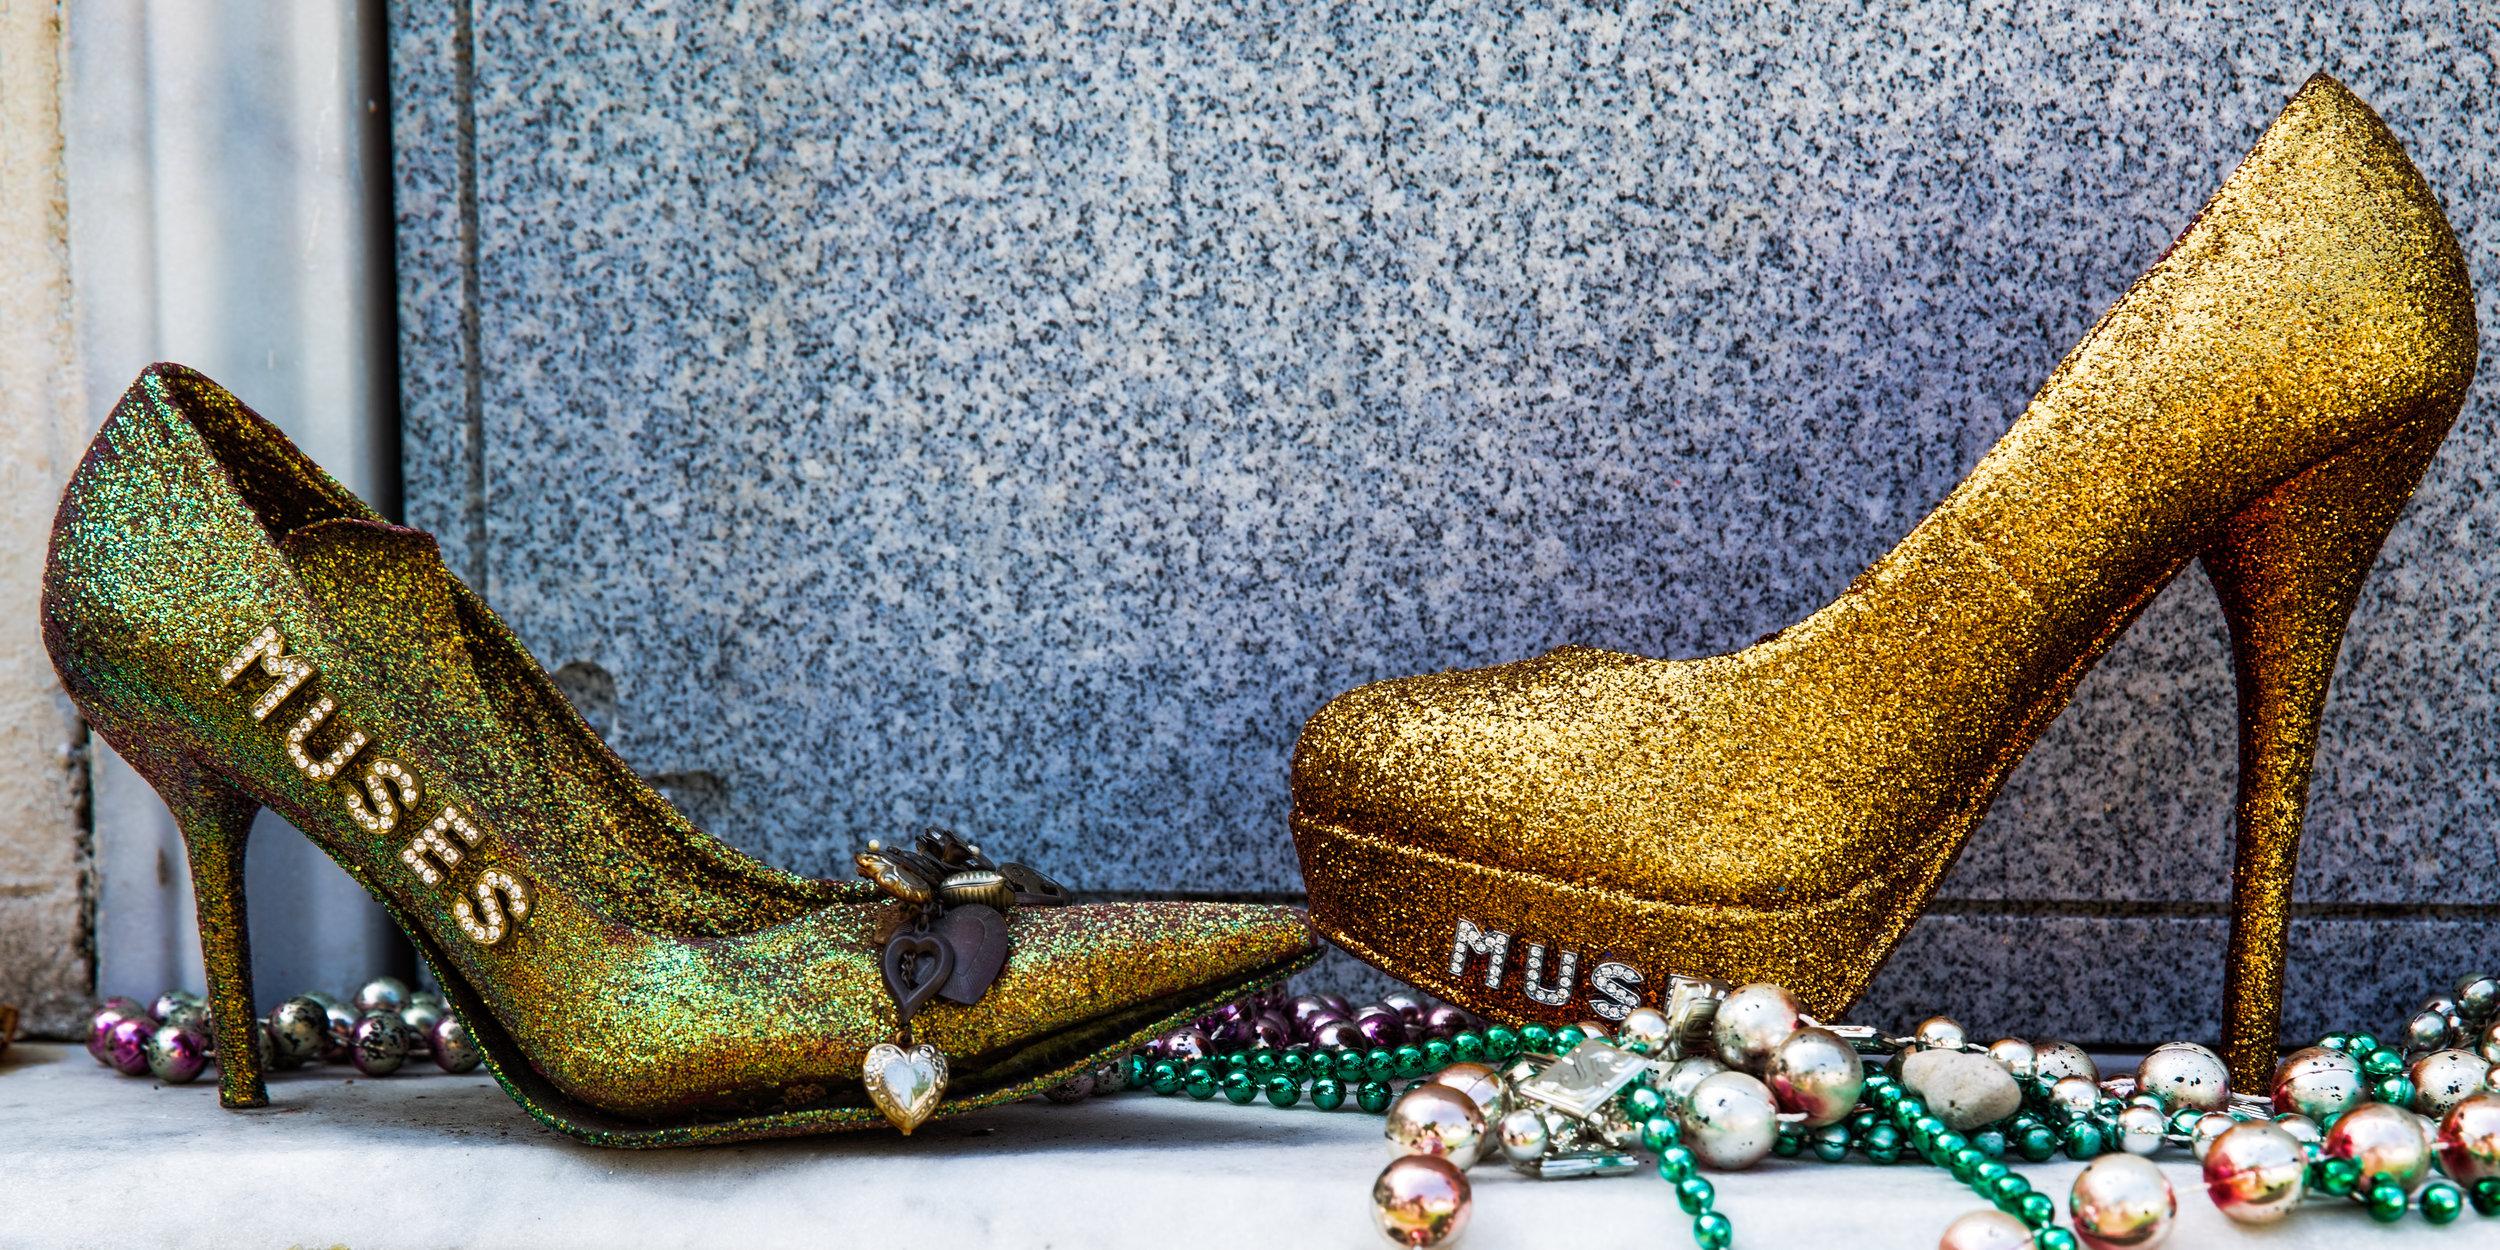 z - Nola High Heels.jpg